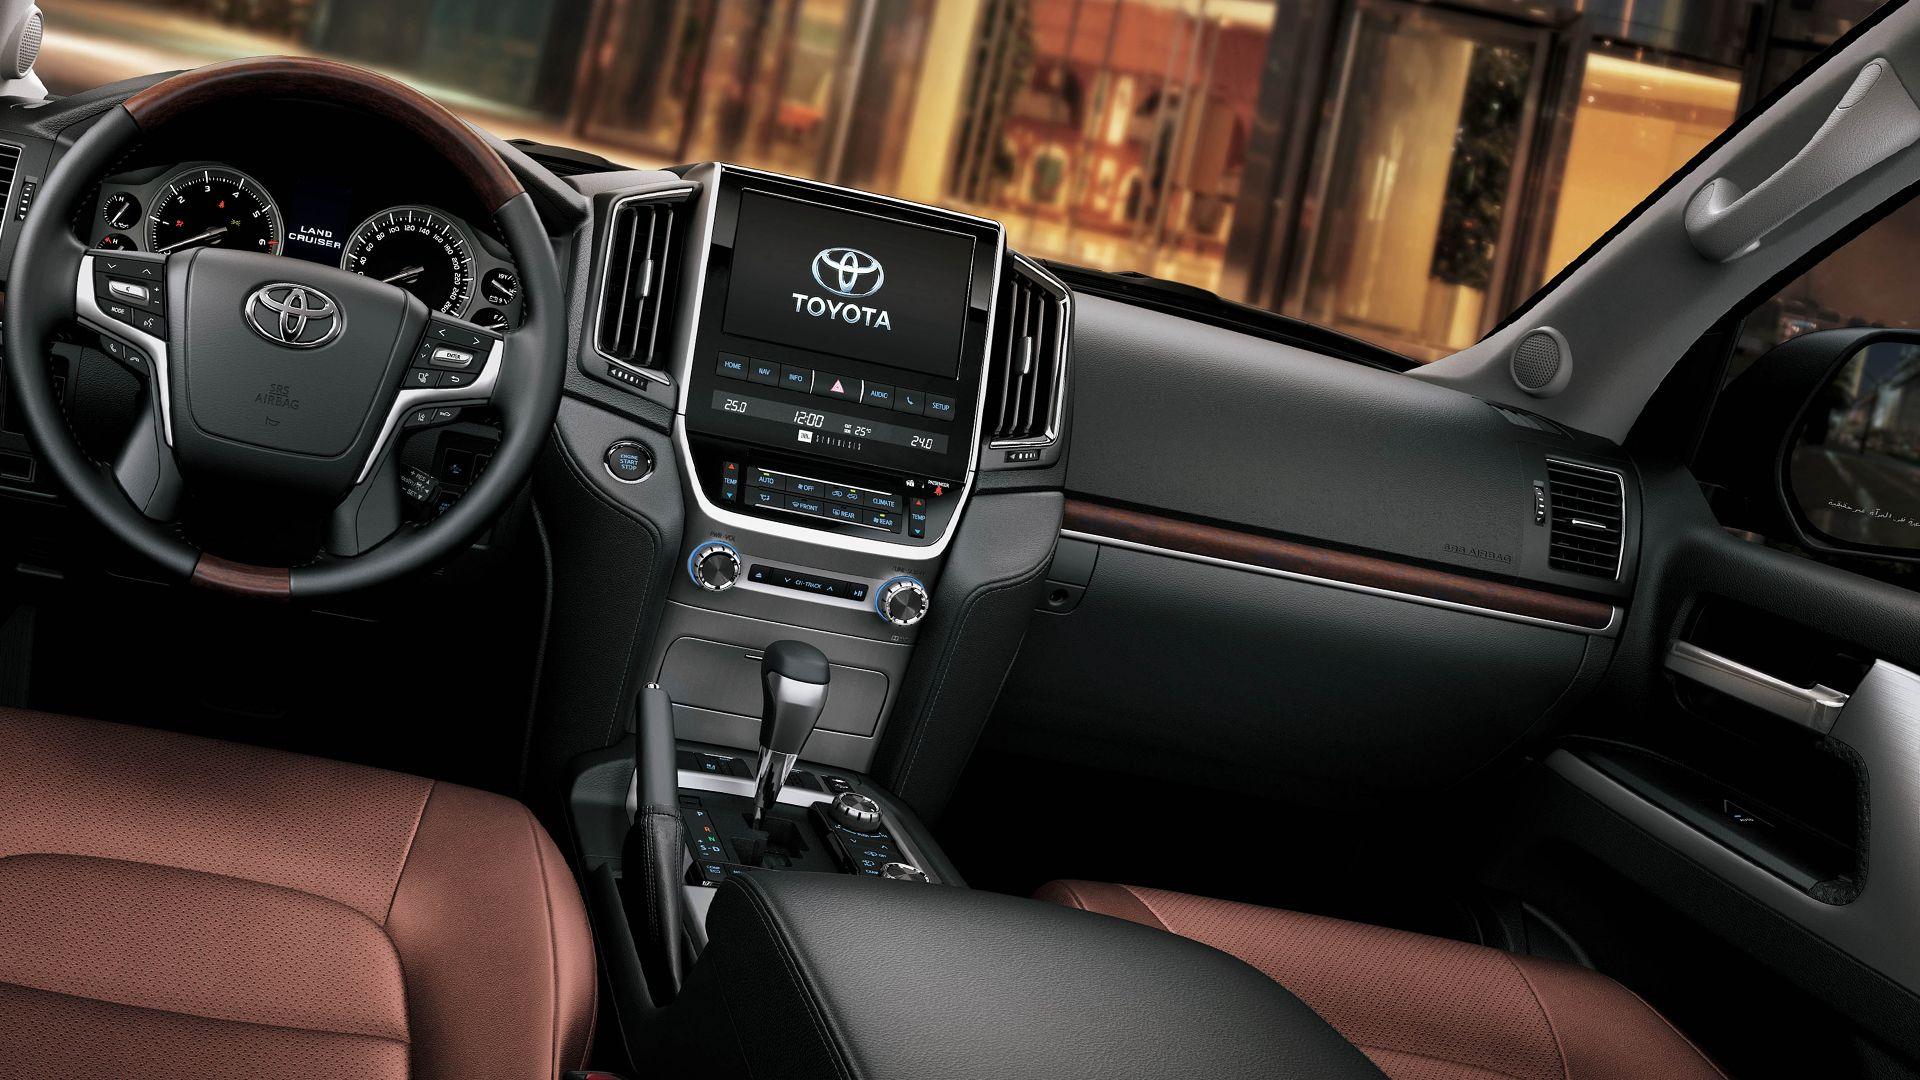 New 2019 Toyota Land Cruiser 200 Interior Design